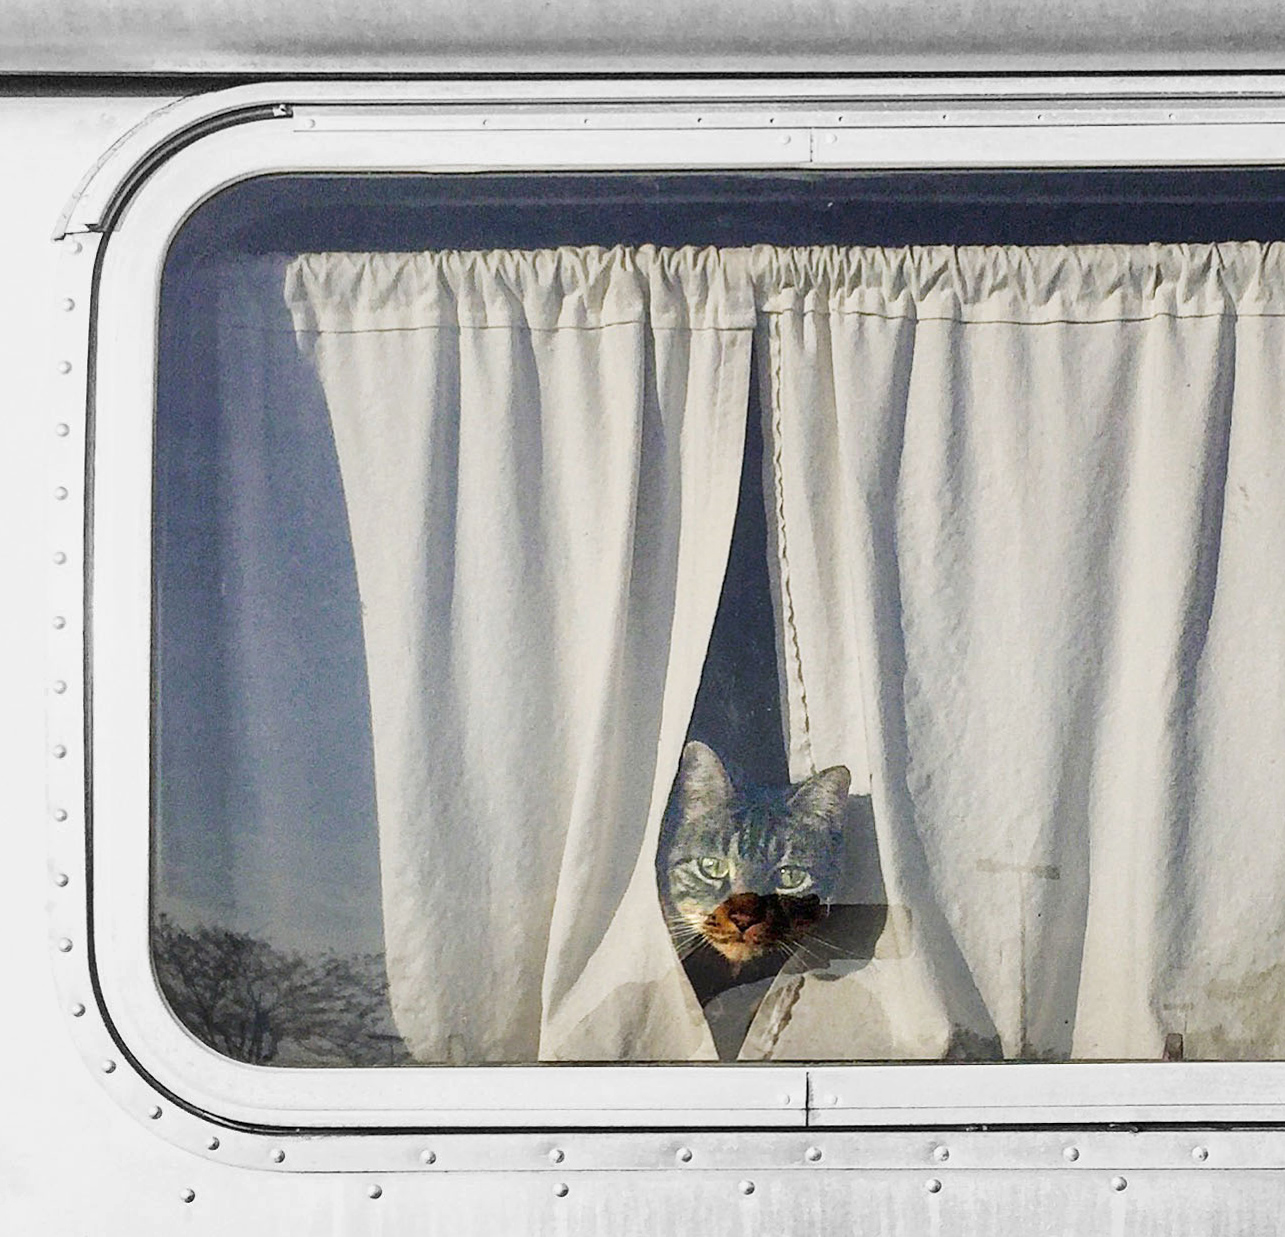 cat peeking through curtains in airstream